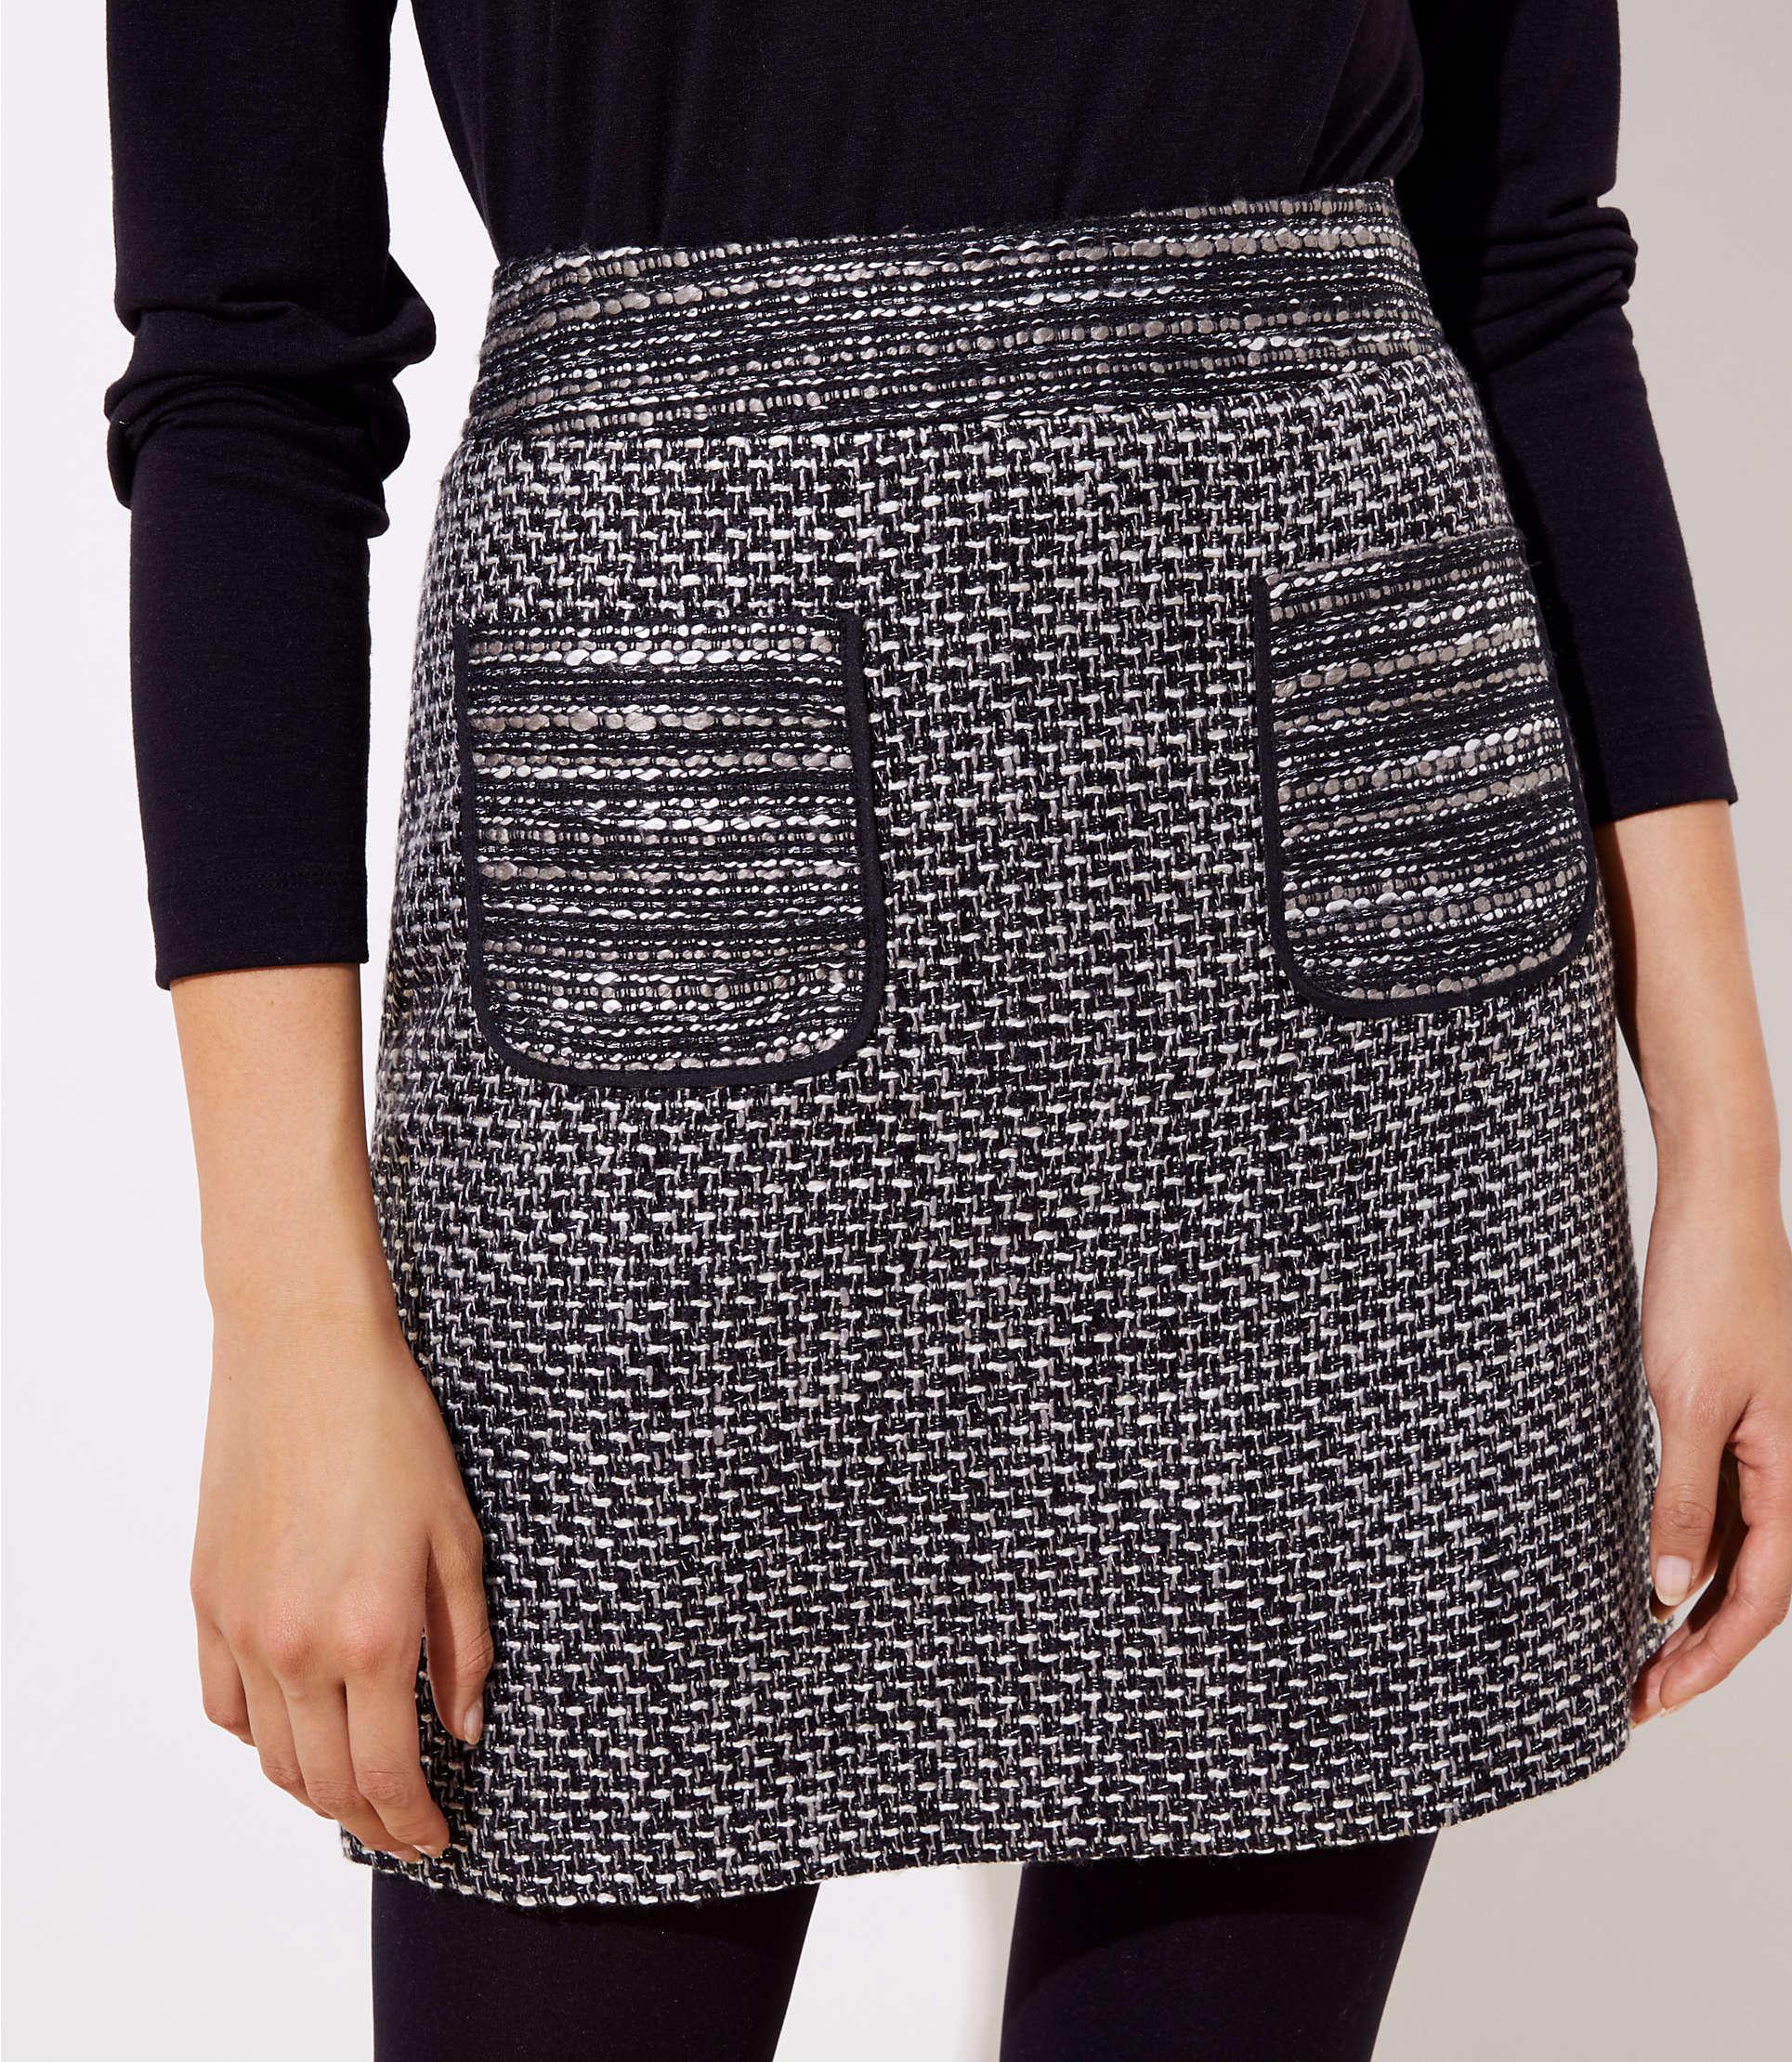 c8fa58d6a20 ... Tweed Pocket Skirt - Lyst. View fullscreen